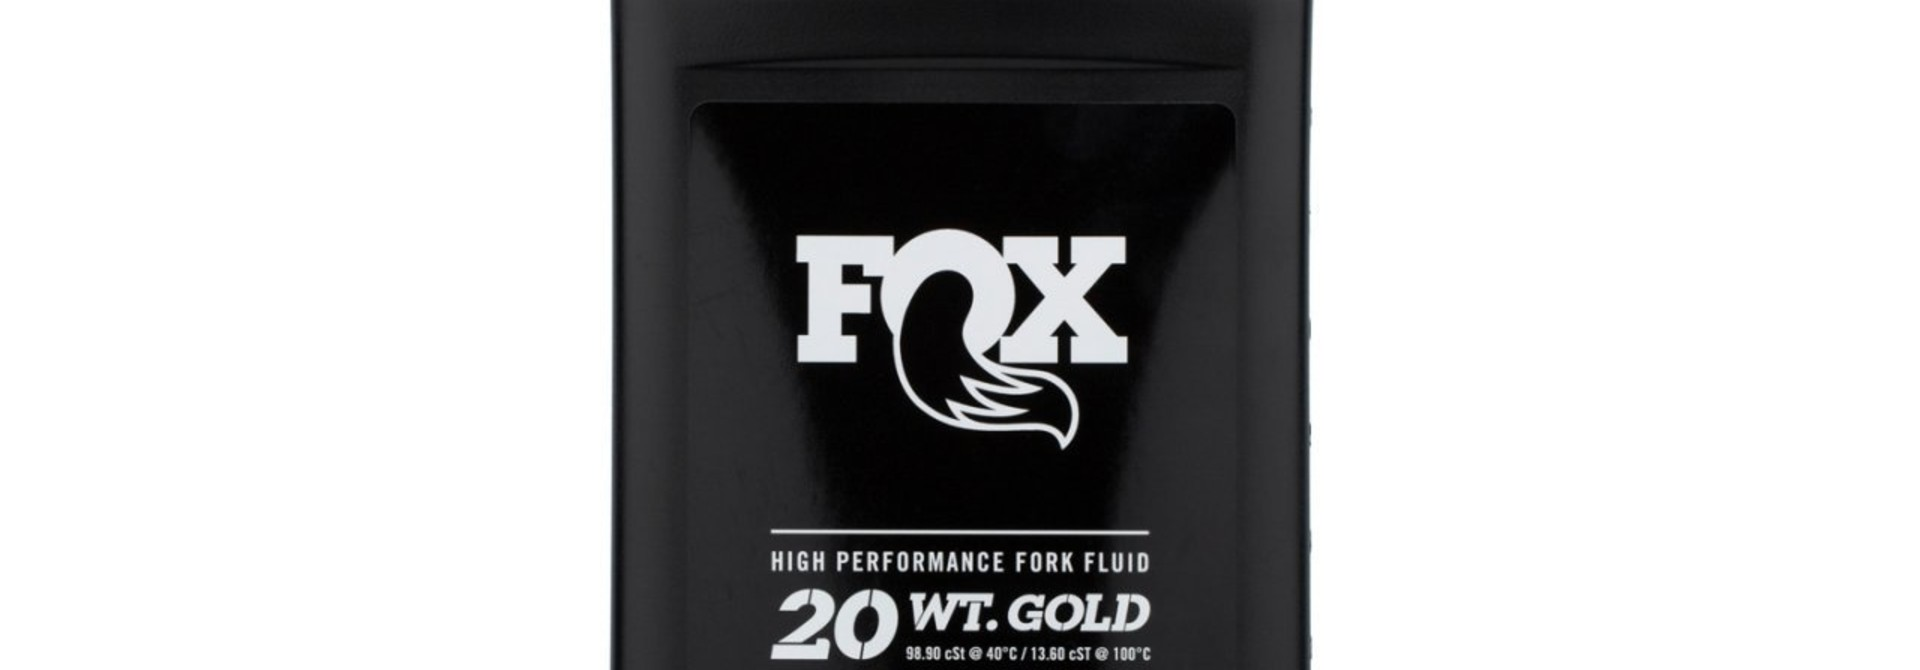 Fox High Performance Fork Fluid - 20 WT. Gold (32 oz)